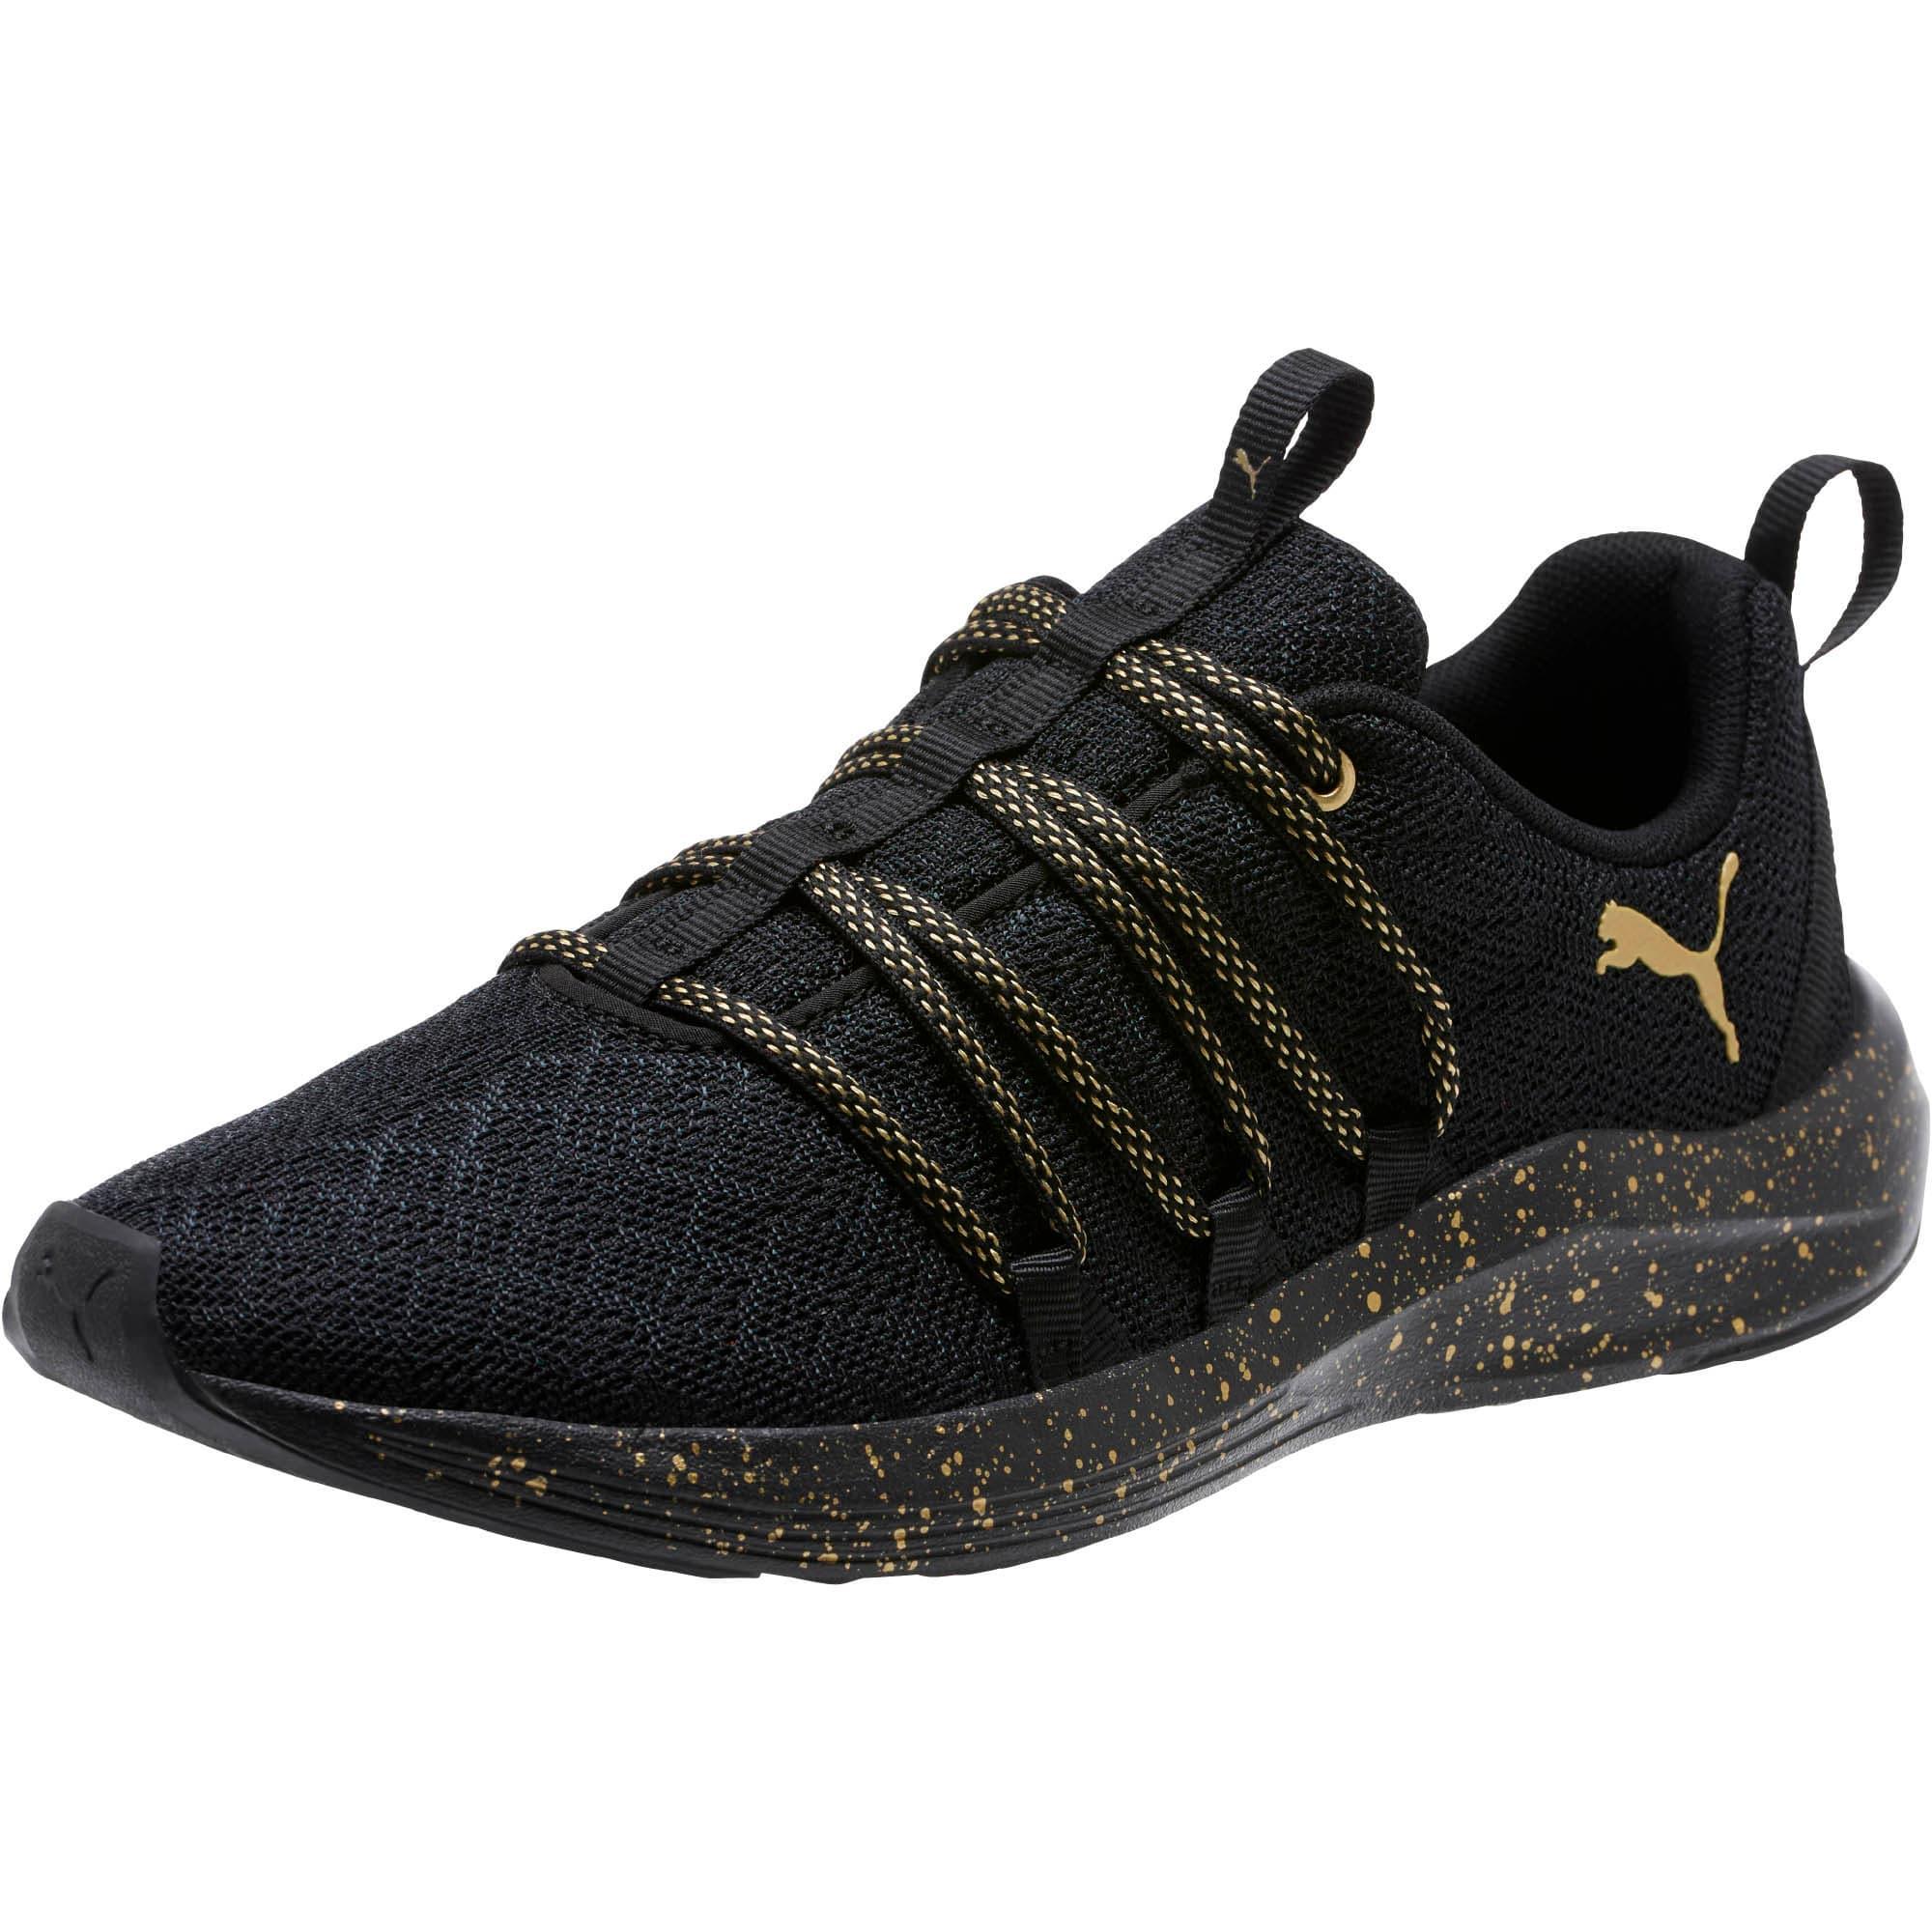 Thumbnail 1 of Prowl Alt Mesh Speckle Women's Training Shoes, Puma Black-Puma Team Gold, medium